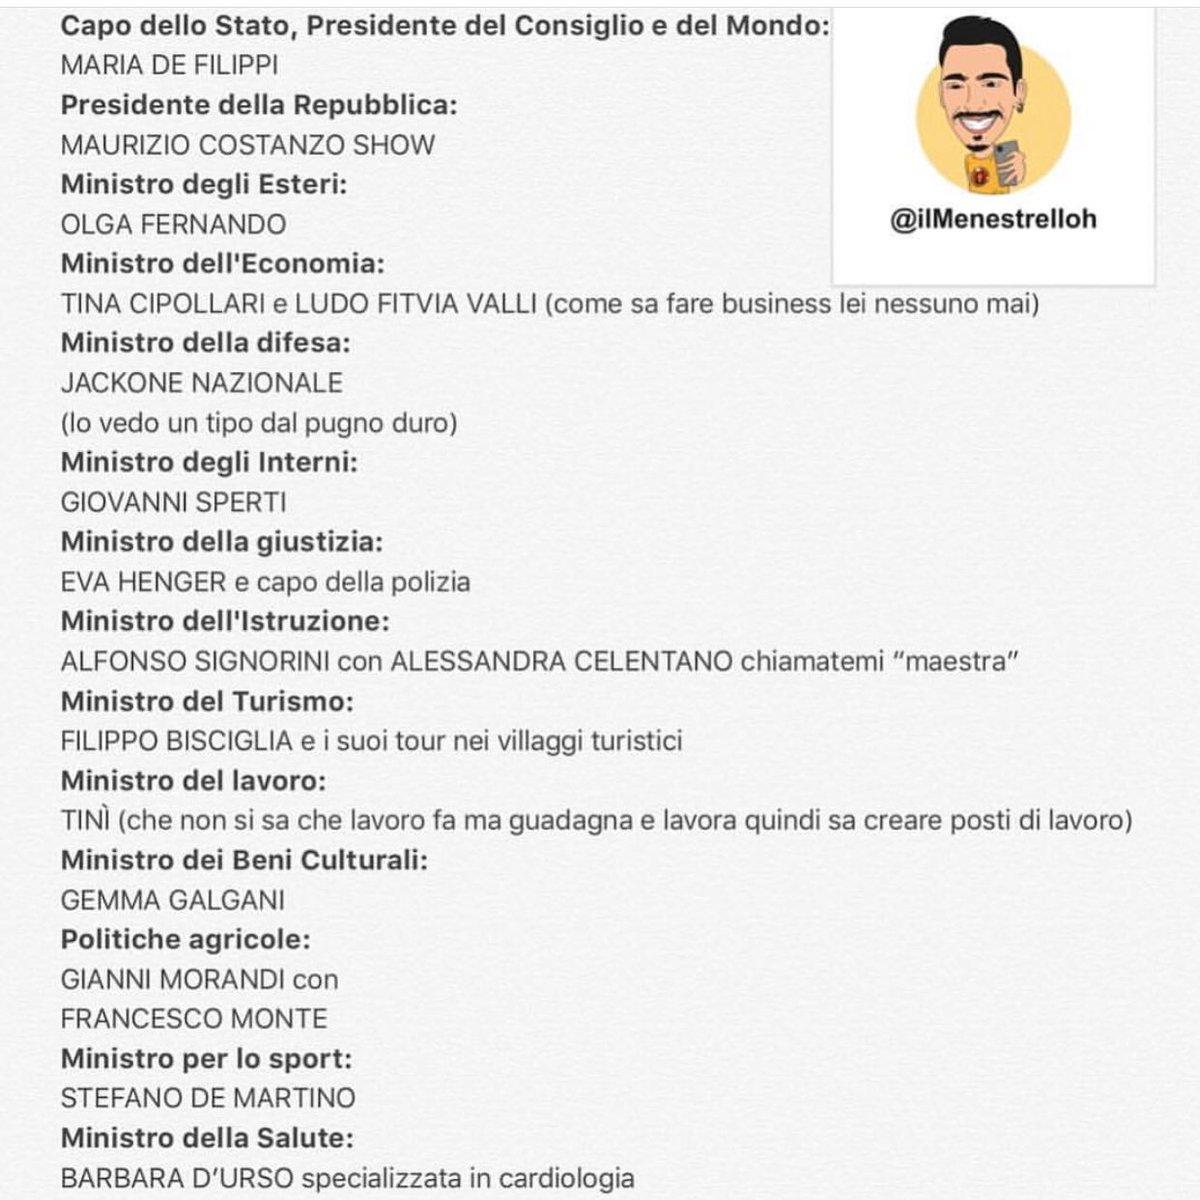 RT @queenmari_mc: Morta 😂😂😂 #tempationisland #Amici17 #uominiedonne @giannispertioff https://t.co/xkOY5Xwo01